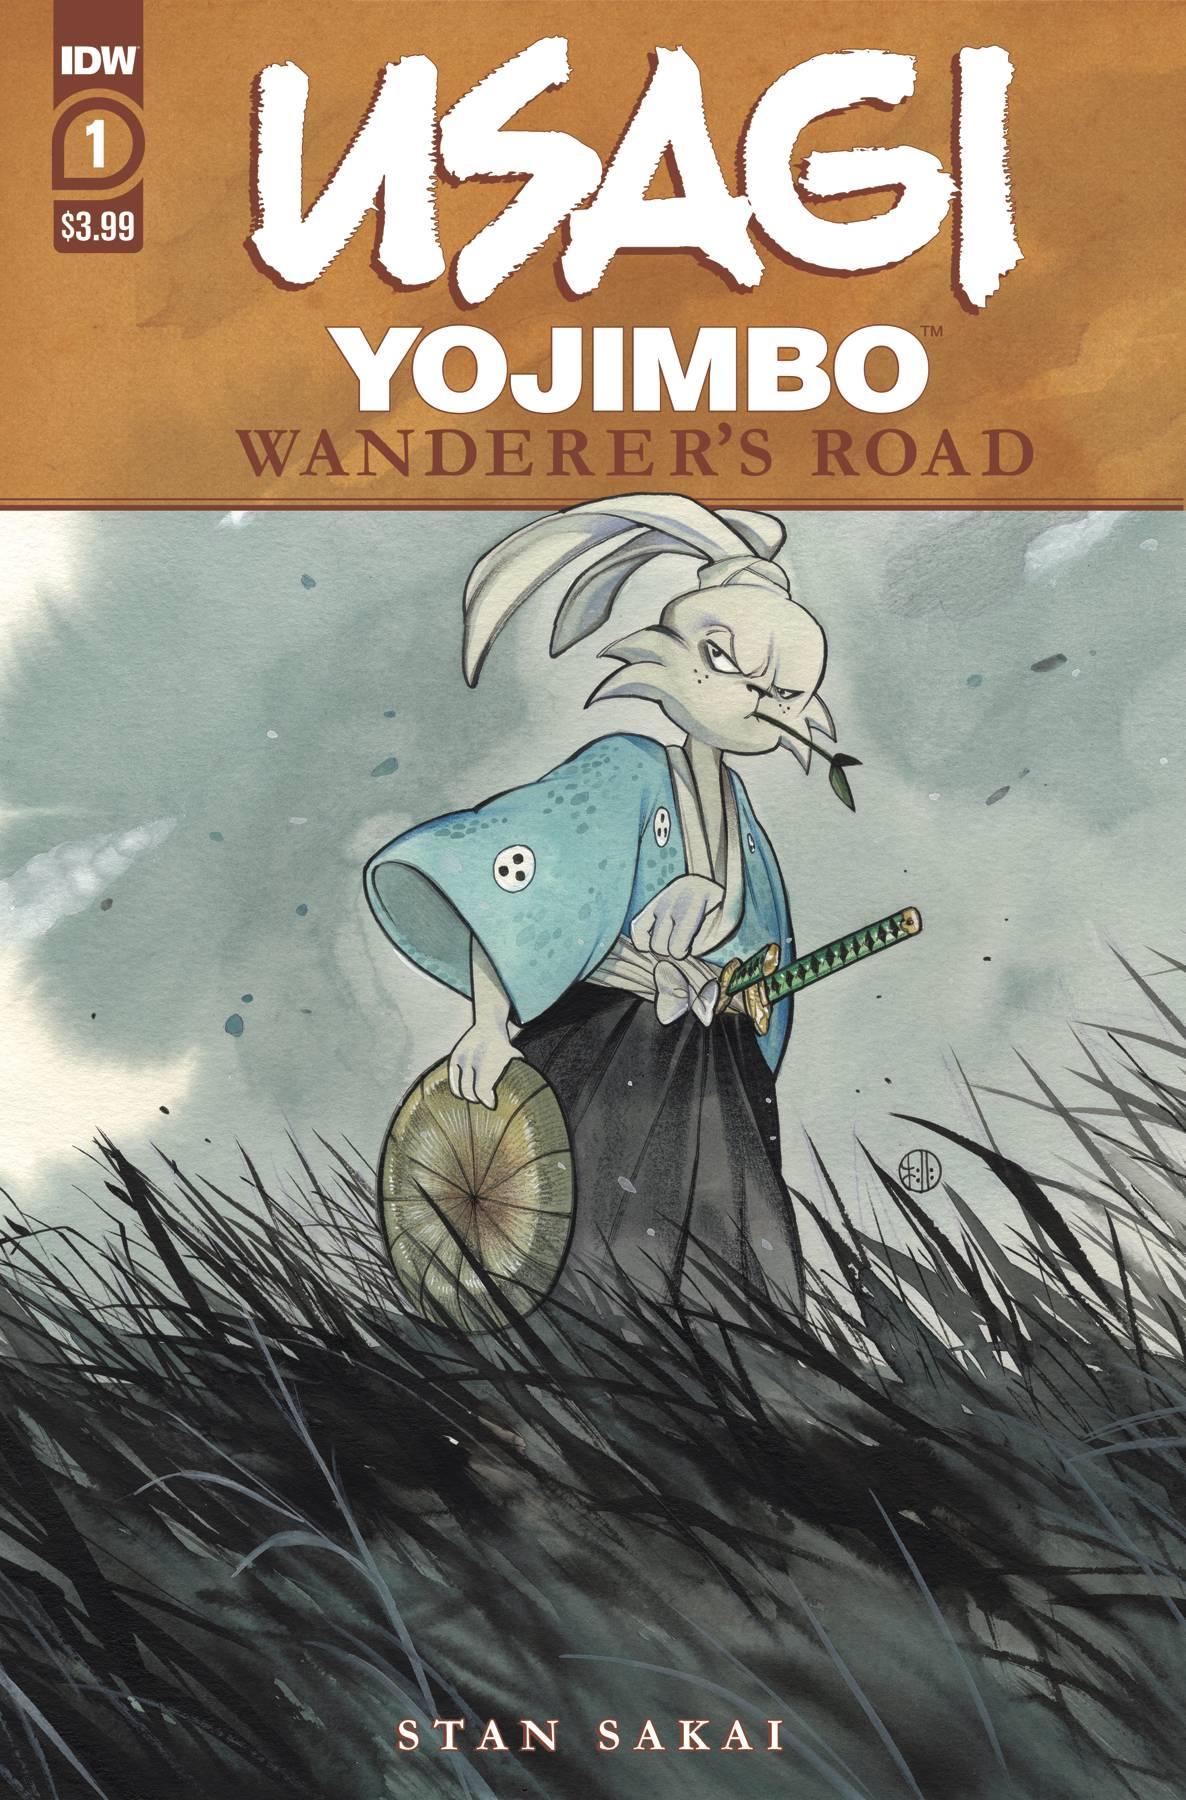 Usagi Yojimbo: Wanderers Road #1 (2020)